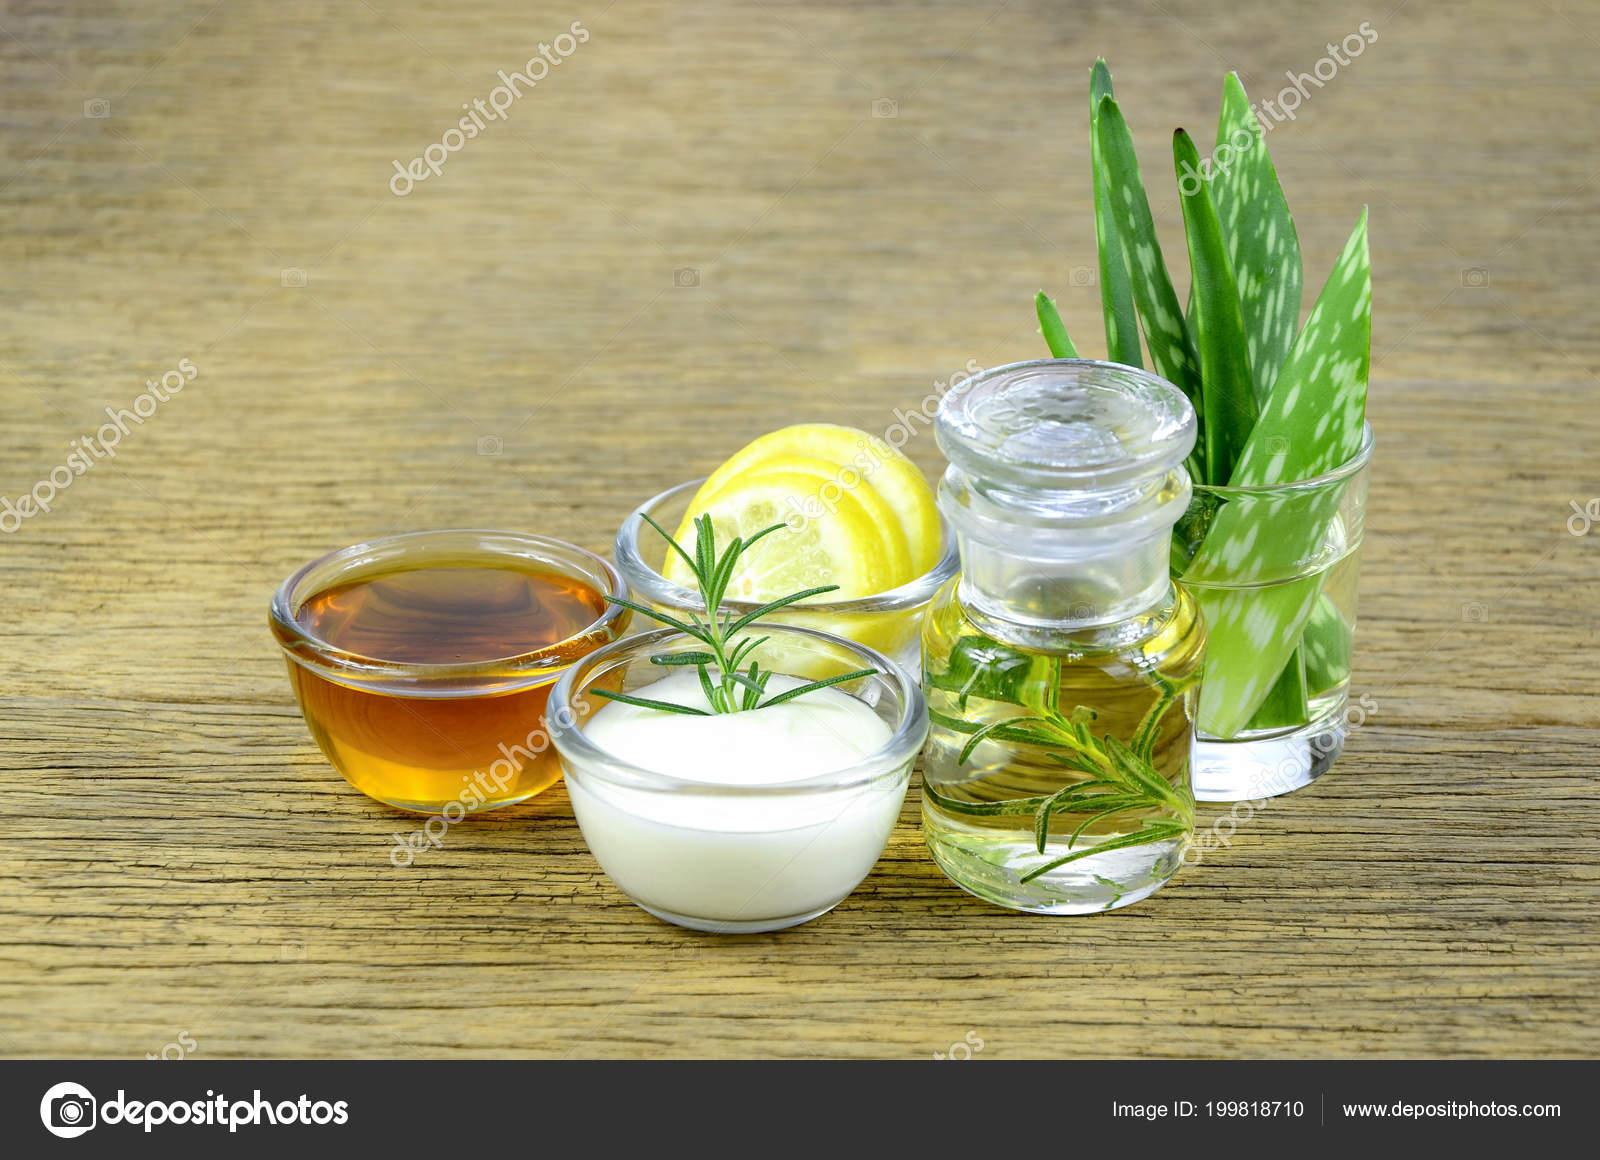 Honey Lemon Rosemary Leaves Greek Yogurt Aloe Vera Leaves Essential Stock Photo C Areeya 199818710